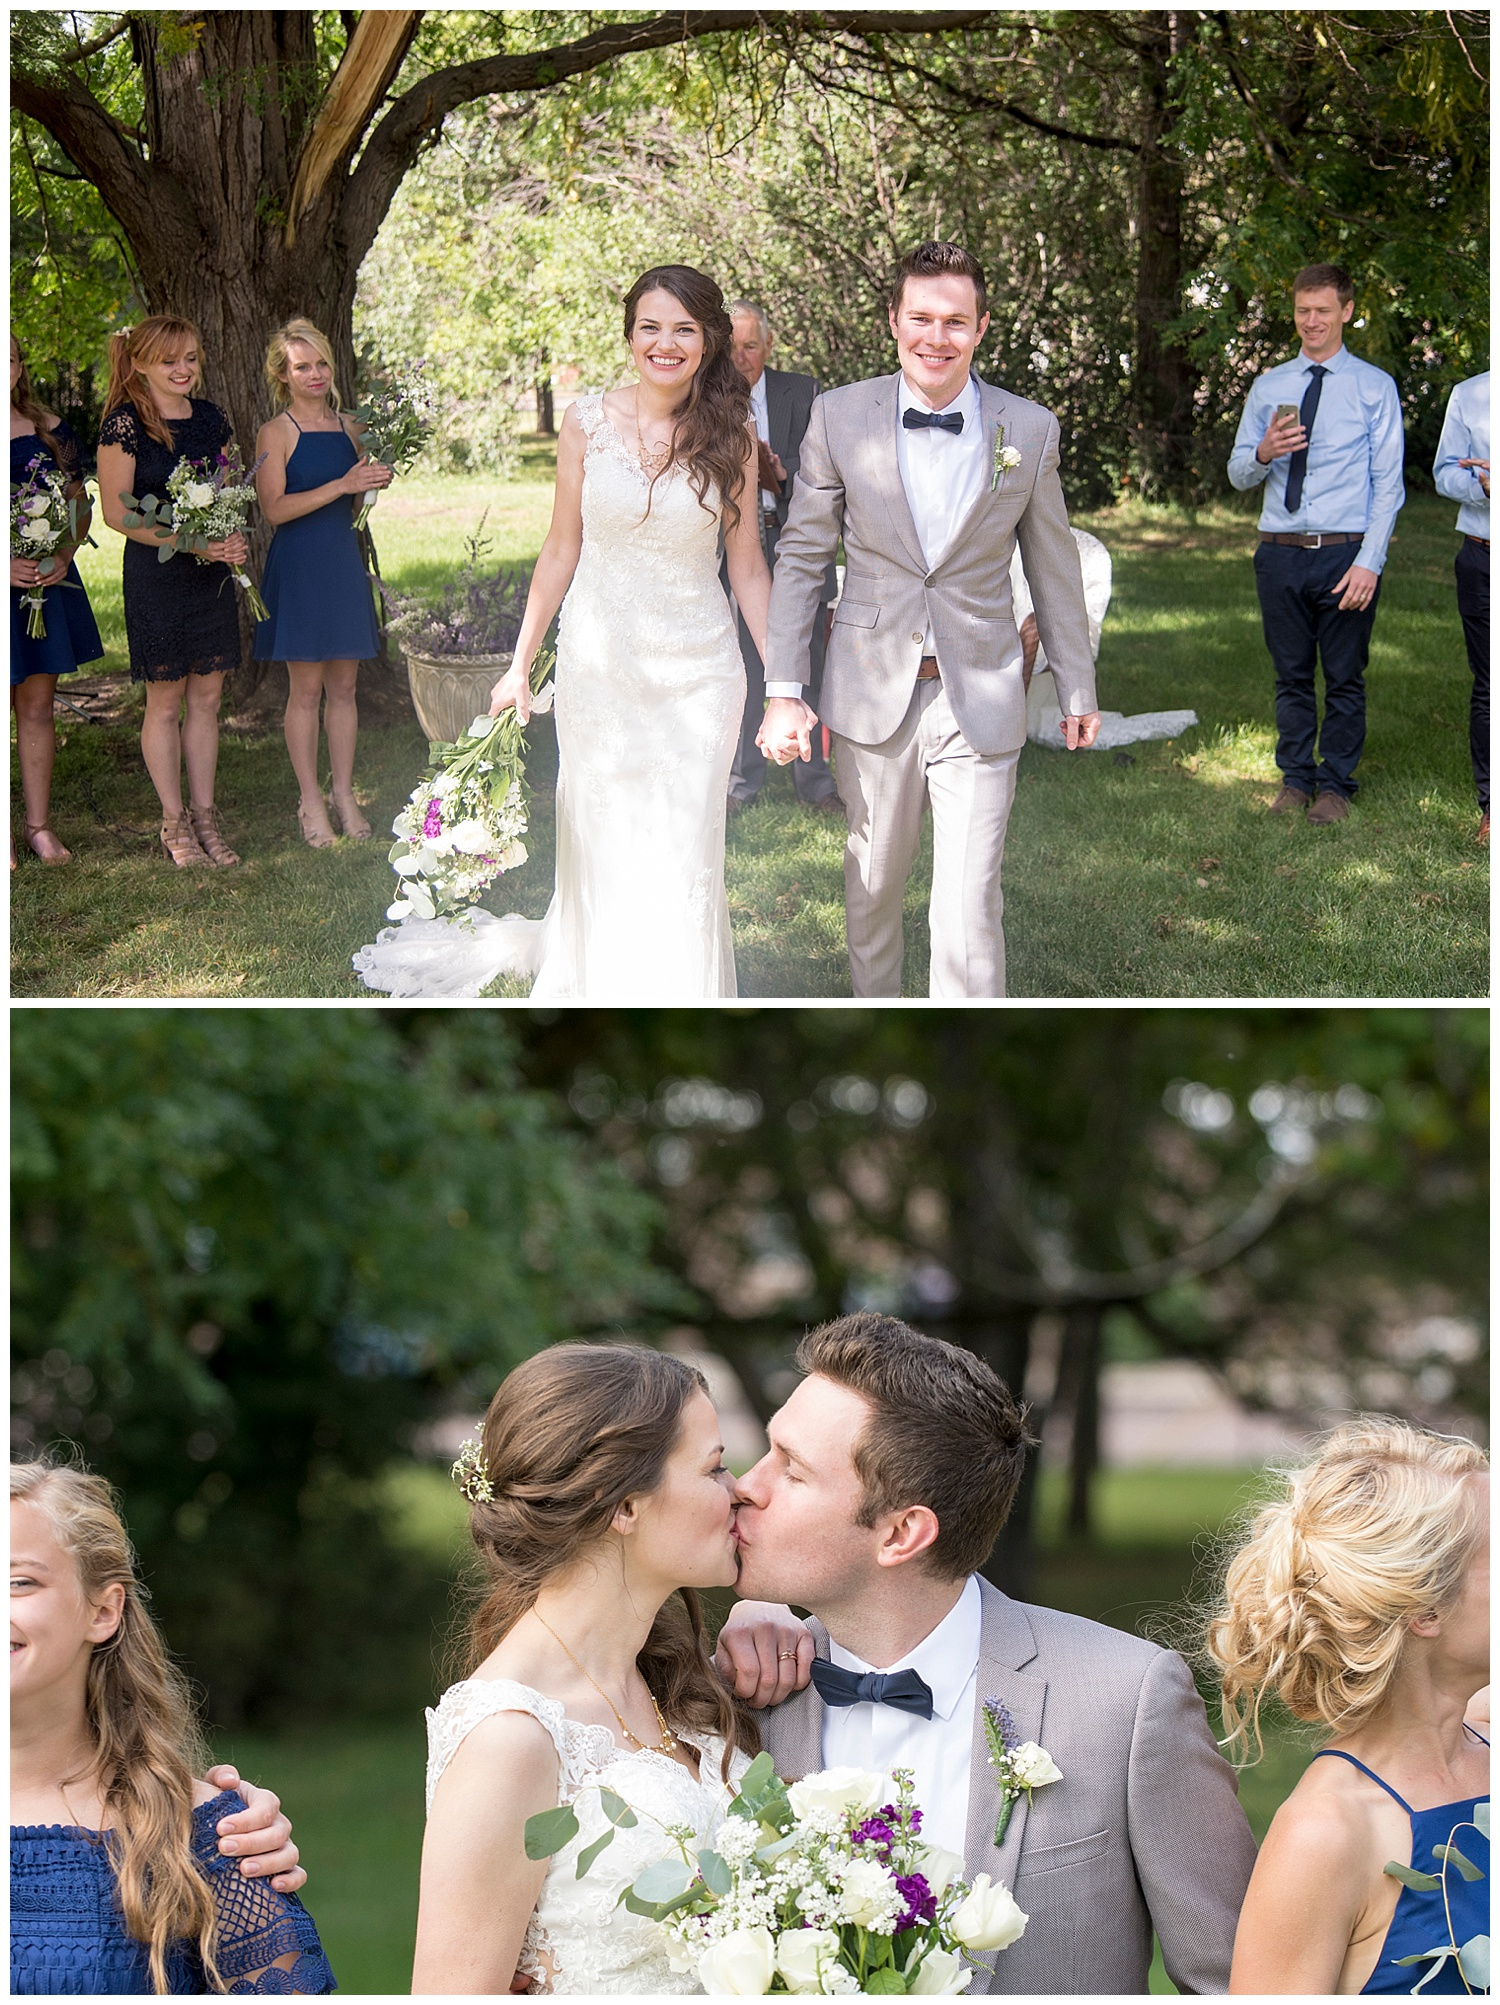 Bride and Groom in Love   Bethany and Jono's Intimate DIY Wedding   Colorado Springs Wedding Photographer   Farm Wedding Photographer   Apollo Fields Wedding Photojournalism